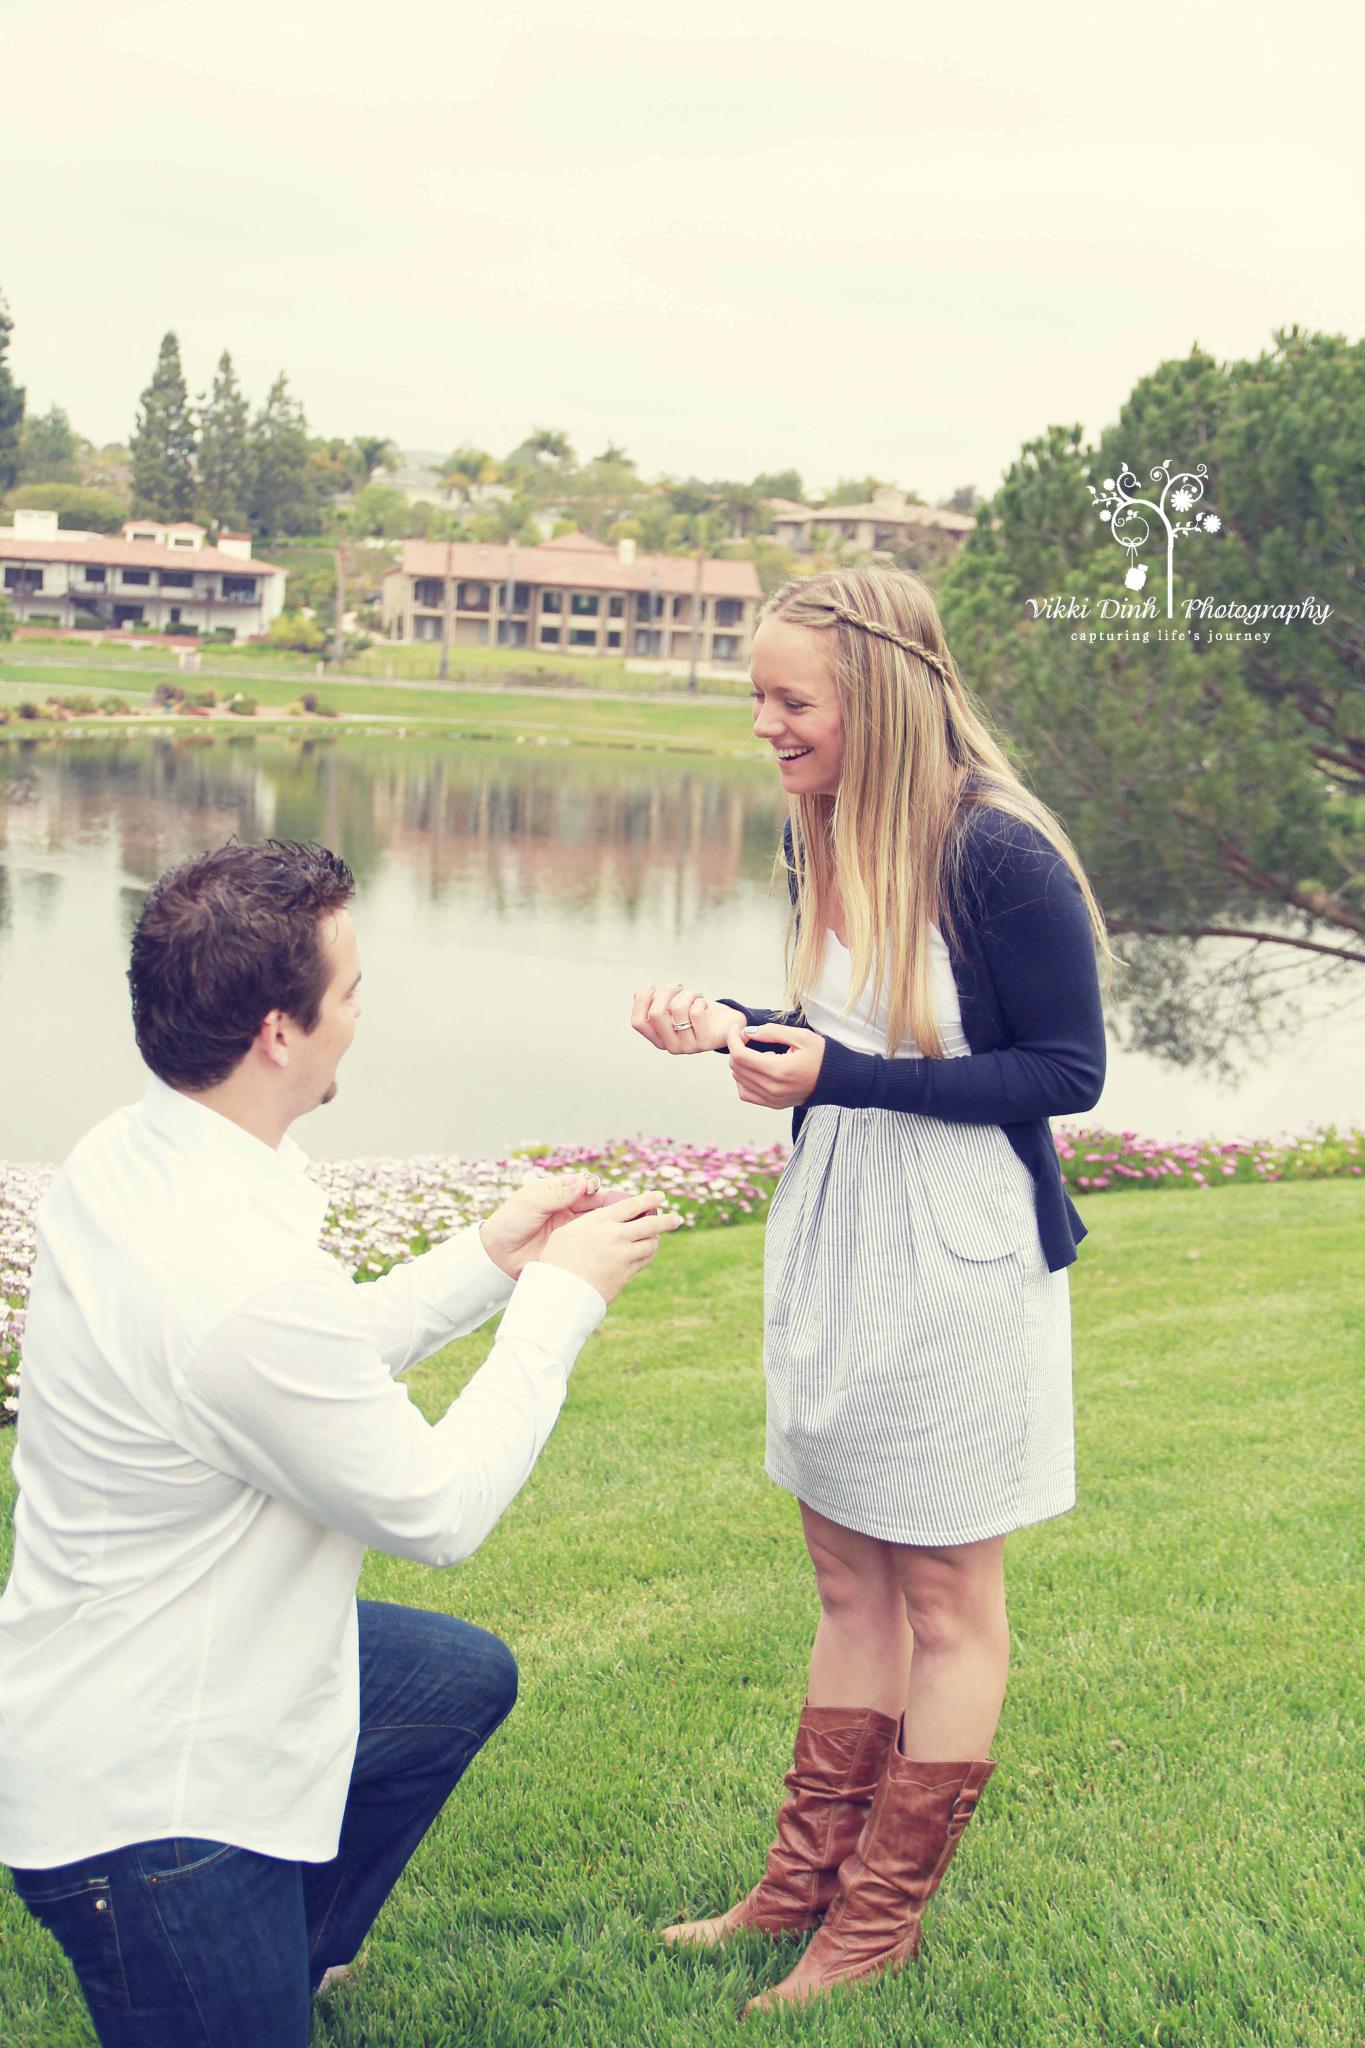 Surprise proposal at photo shoot for Surprise engagement photo shoot